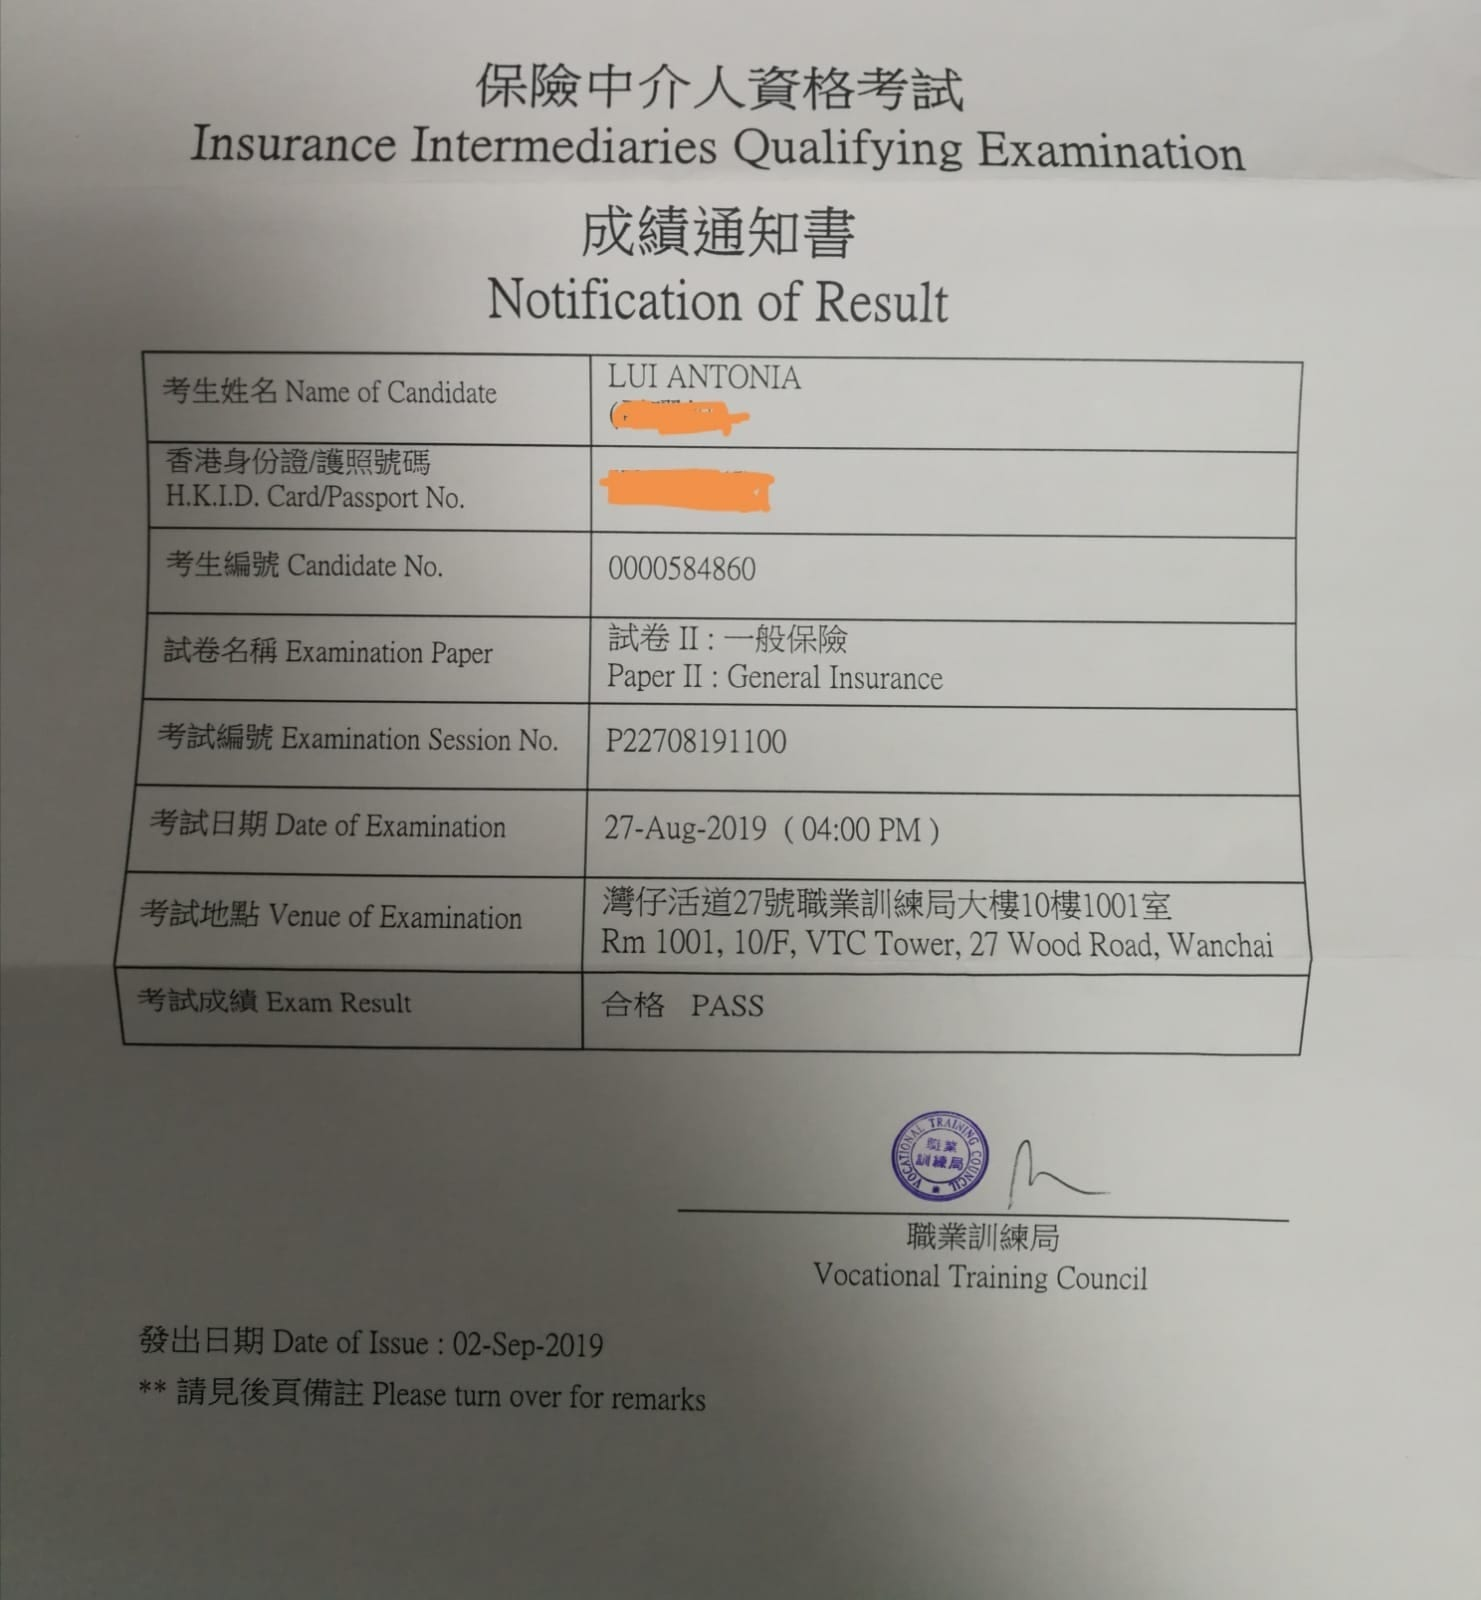 AL 27/8/2019 IIQE Paper 2 保險中介人資格考試卷二 Pass